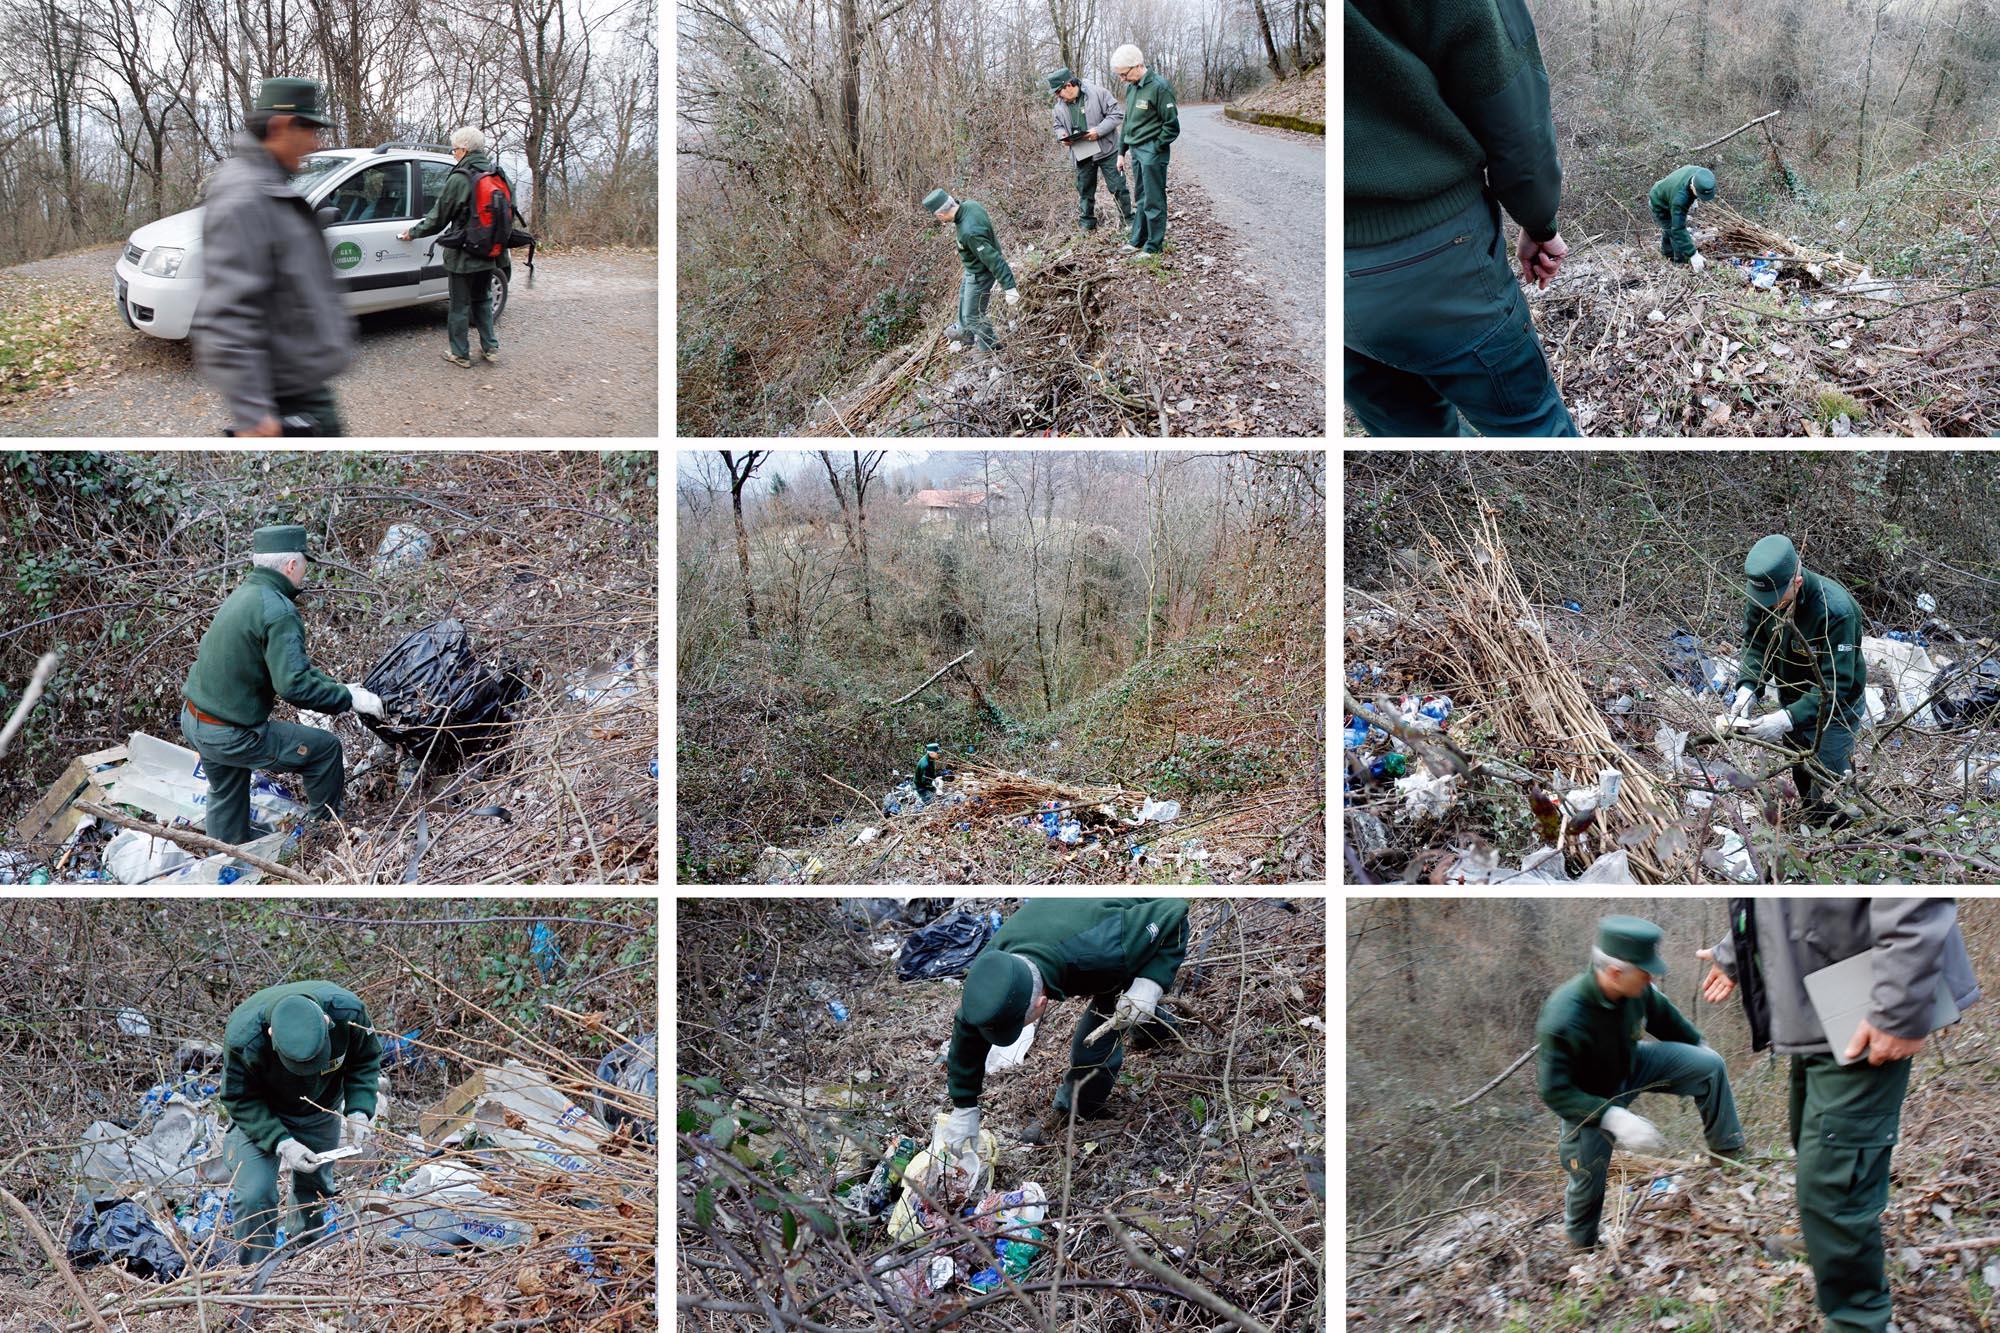 0146 guardie ecologiche volontarie 2 - G.E.V. Guardie Ecologiche Volontarie